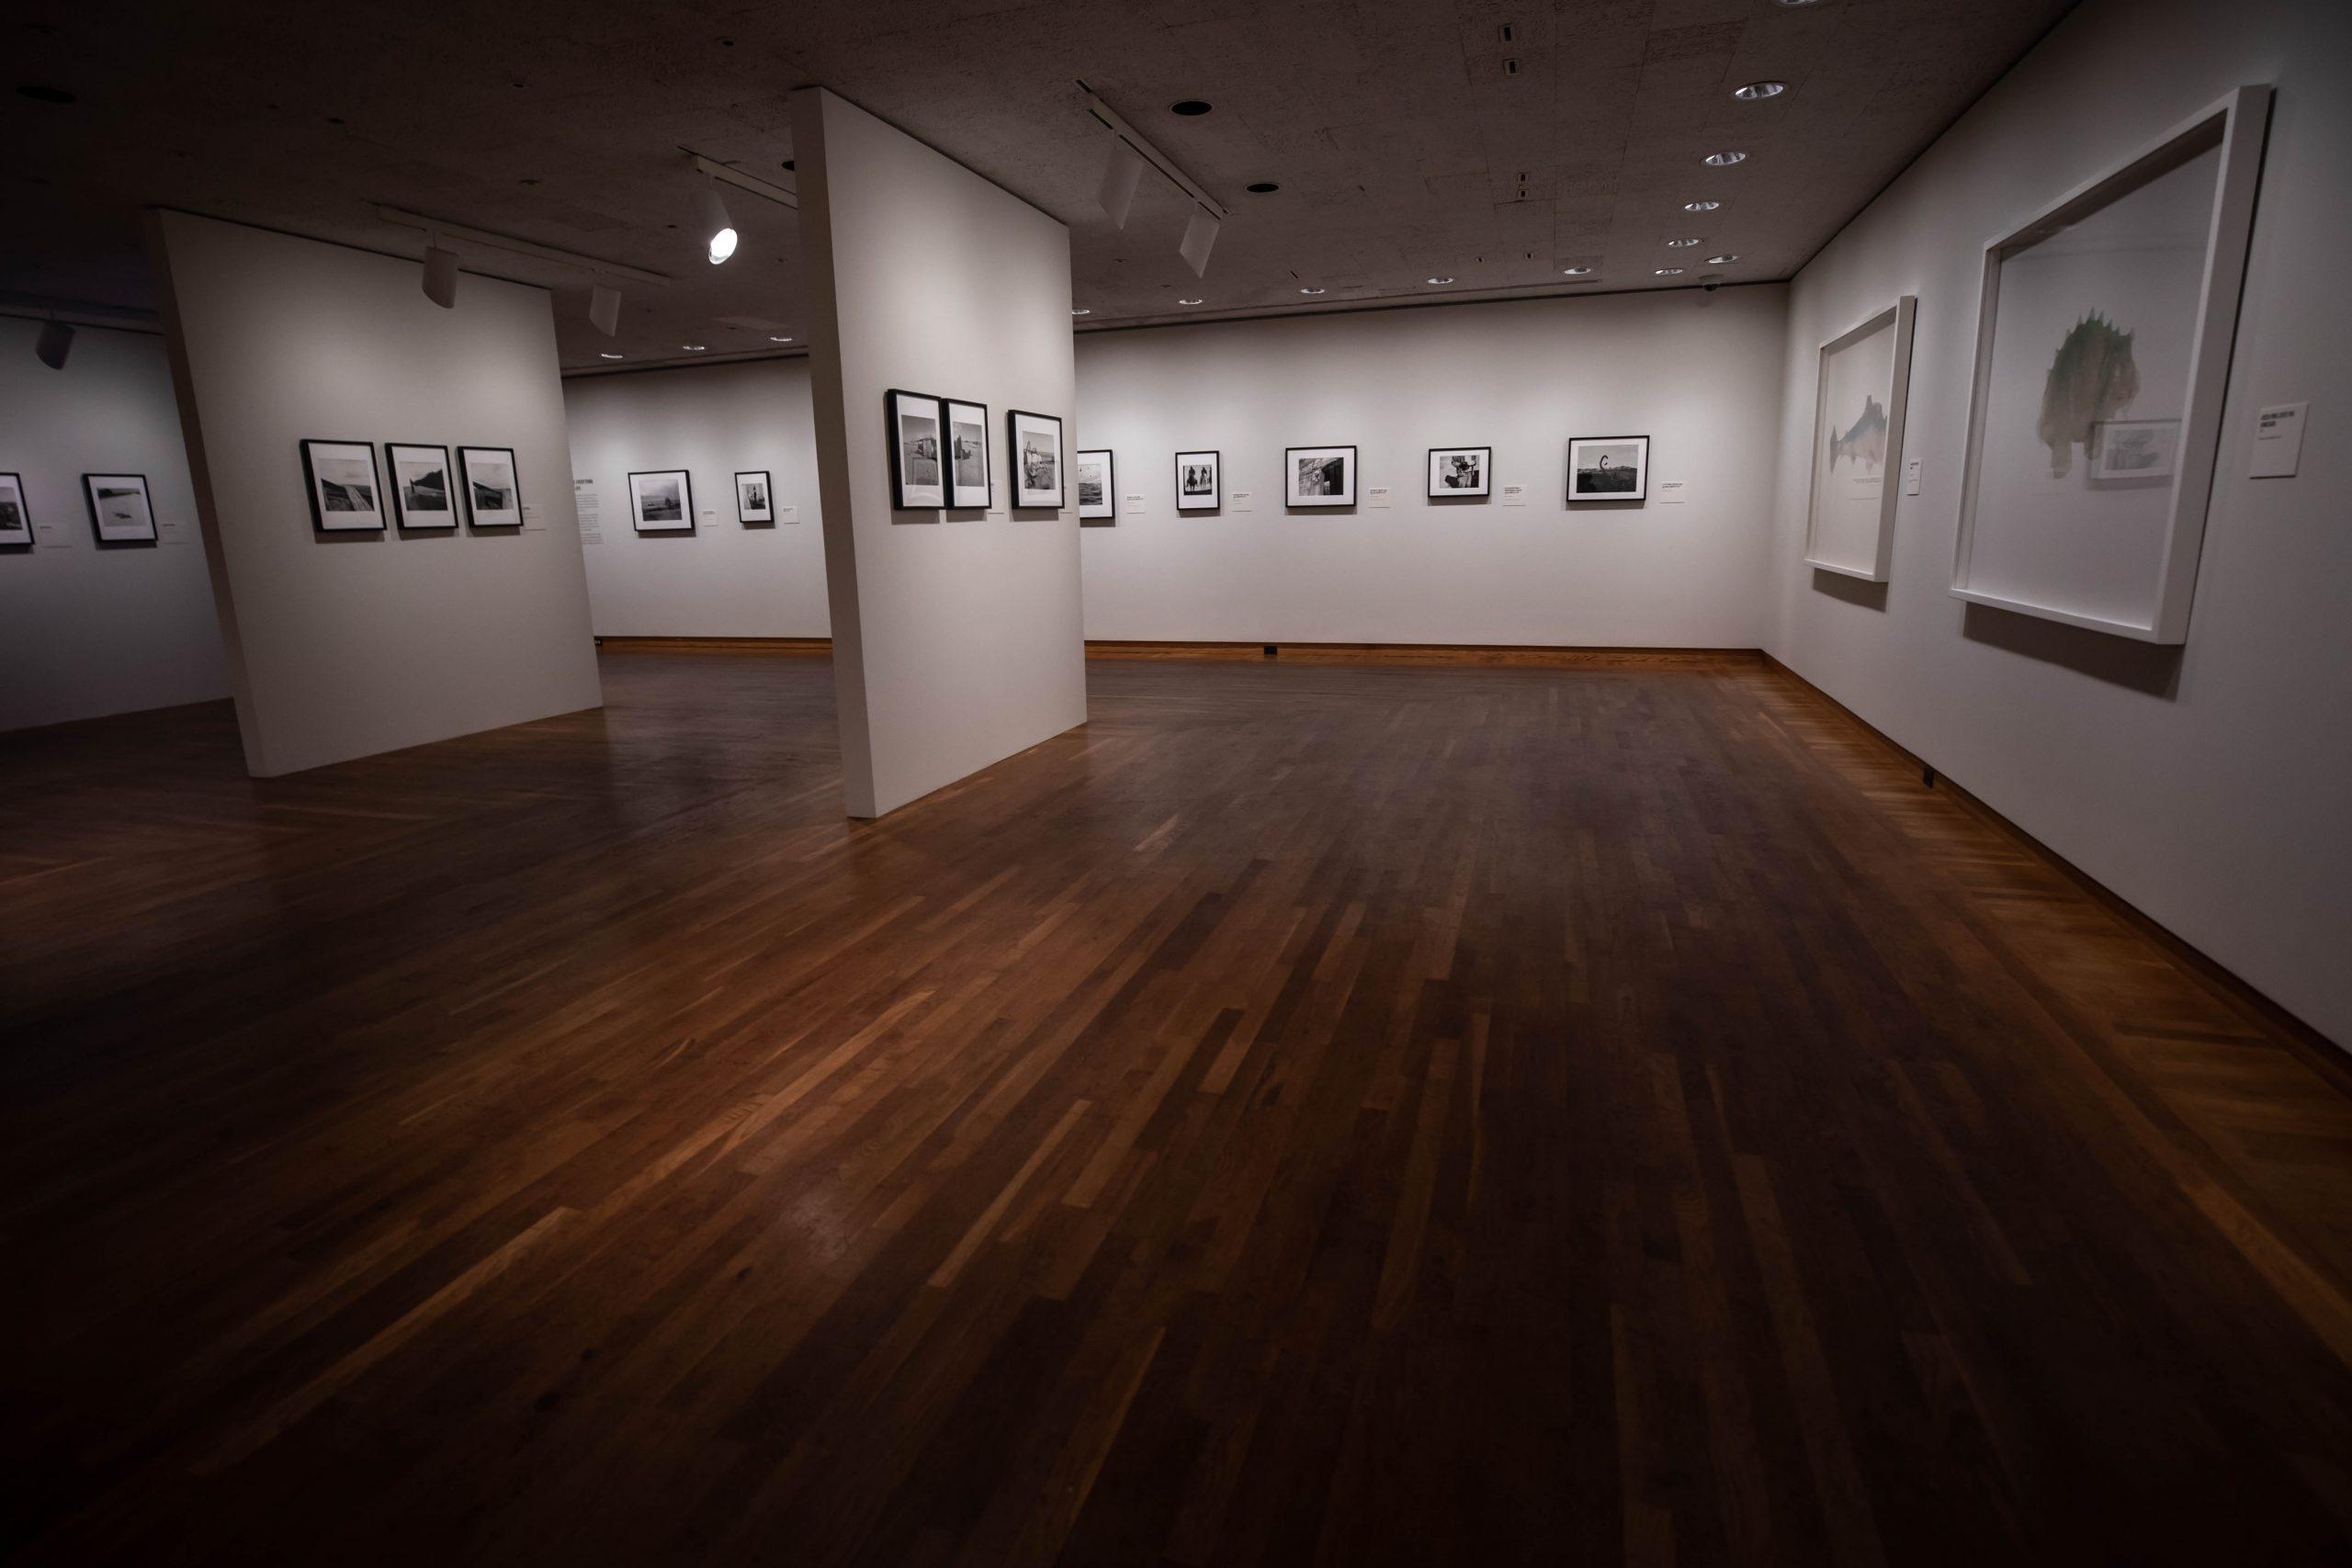 The Art Institute of Chicago in Chicago, Illinois by Annie Fairfax